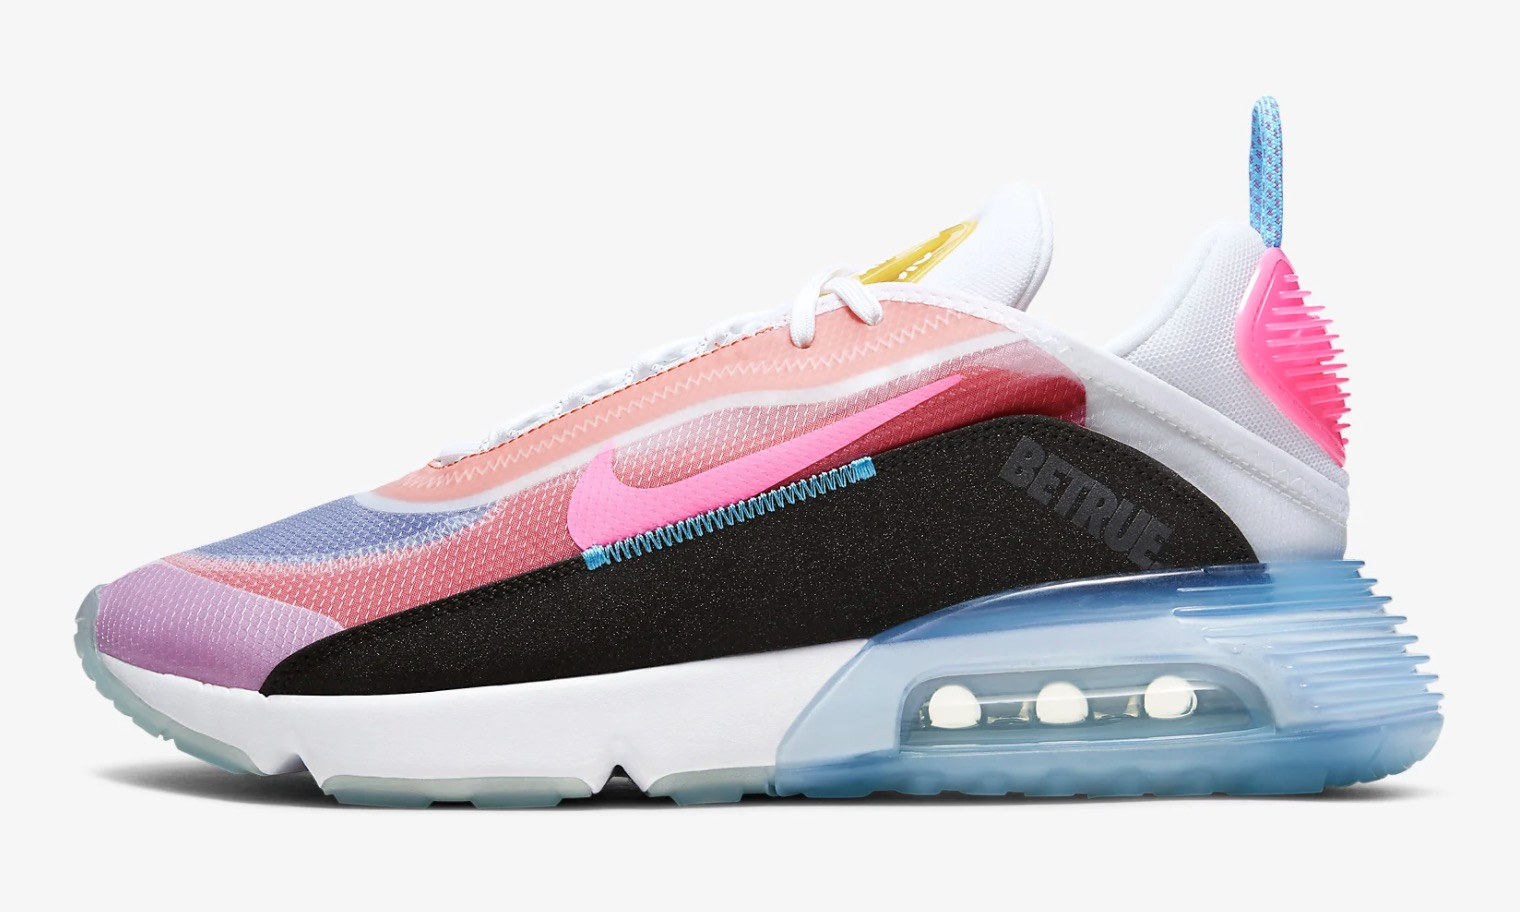 Nike Air Max 2090 BETRUE CZ4090-900 right